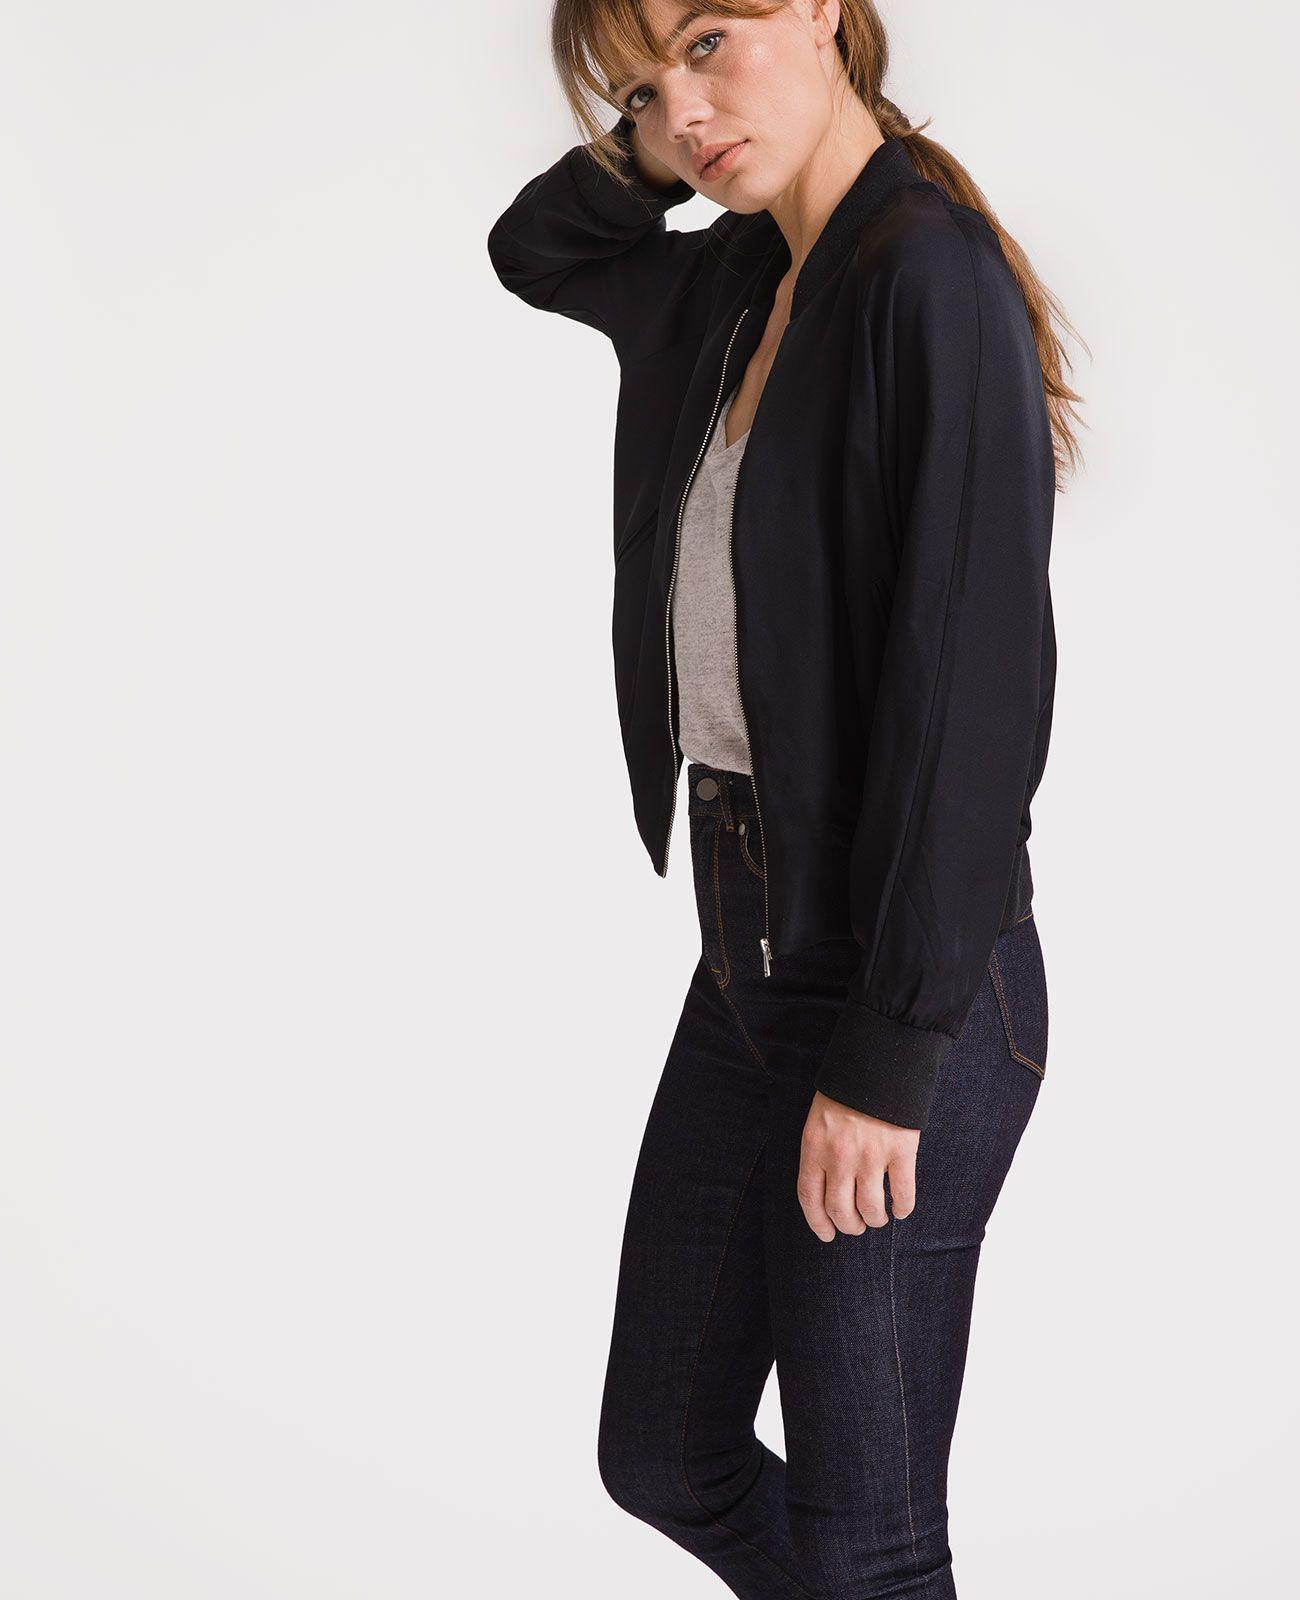 Silk Bomber Style Silk bomber jacket, Silk, Bomber jacket